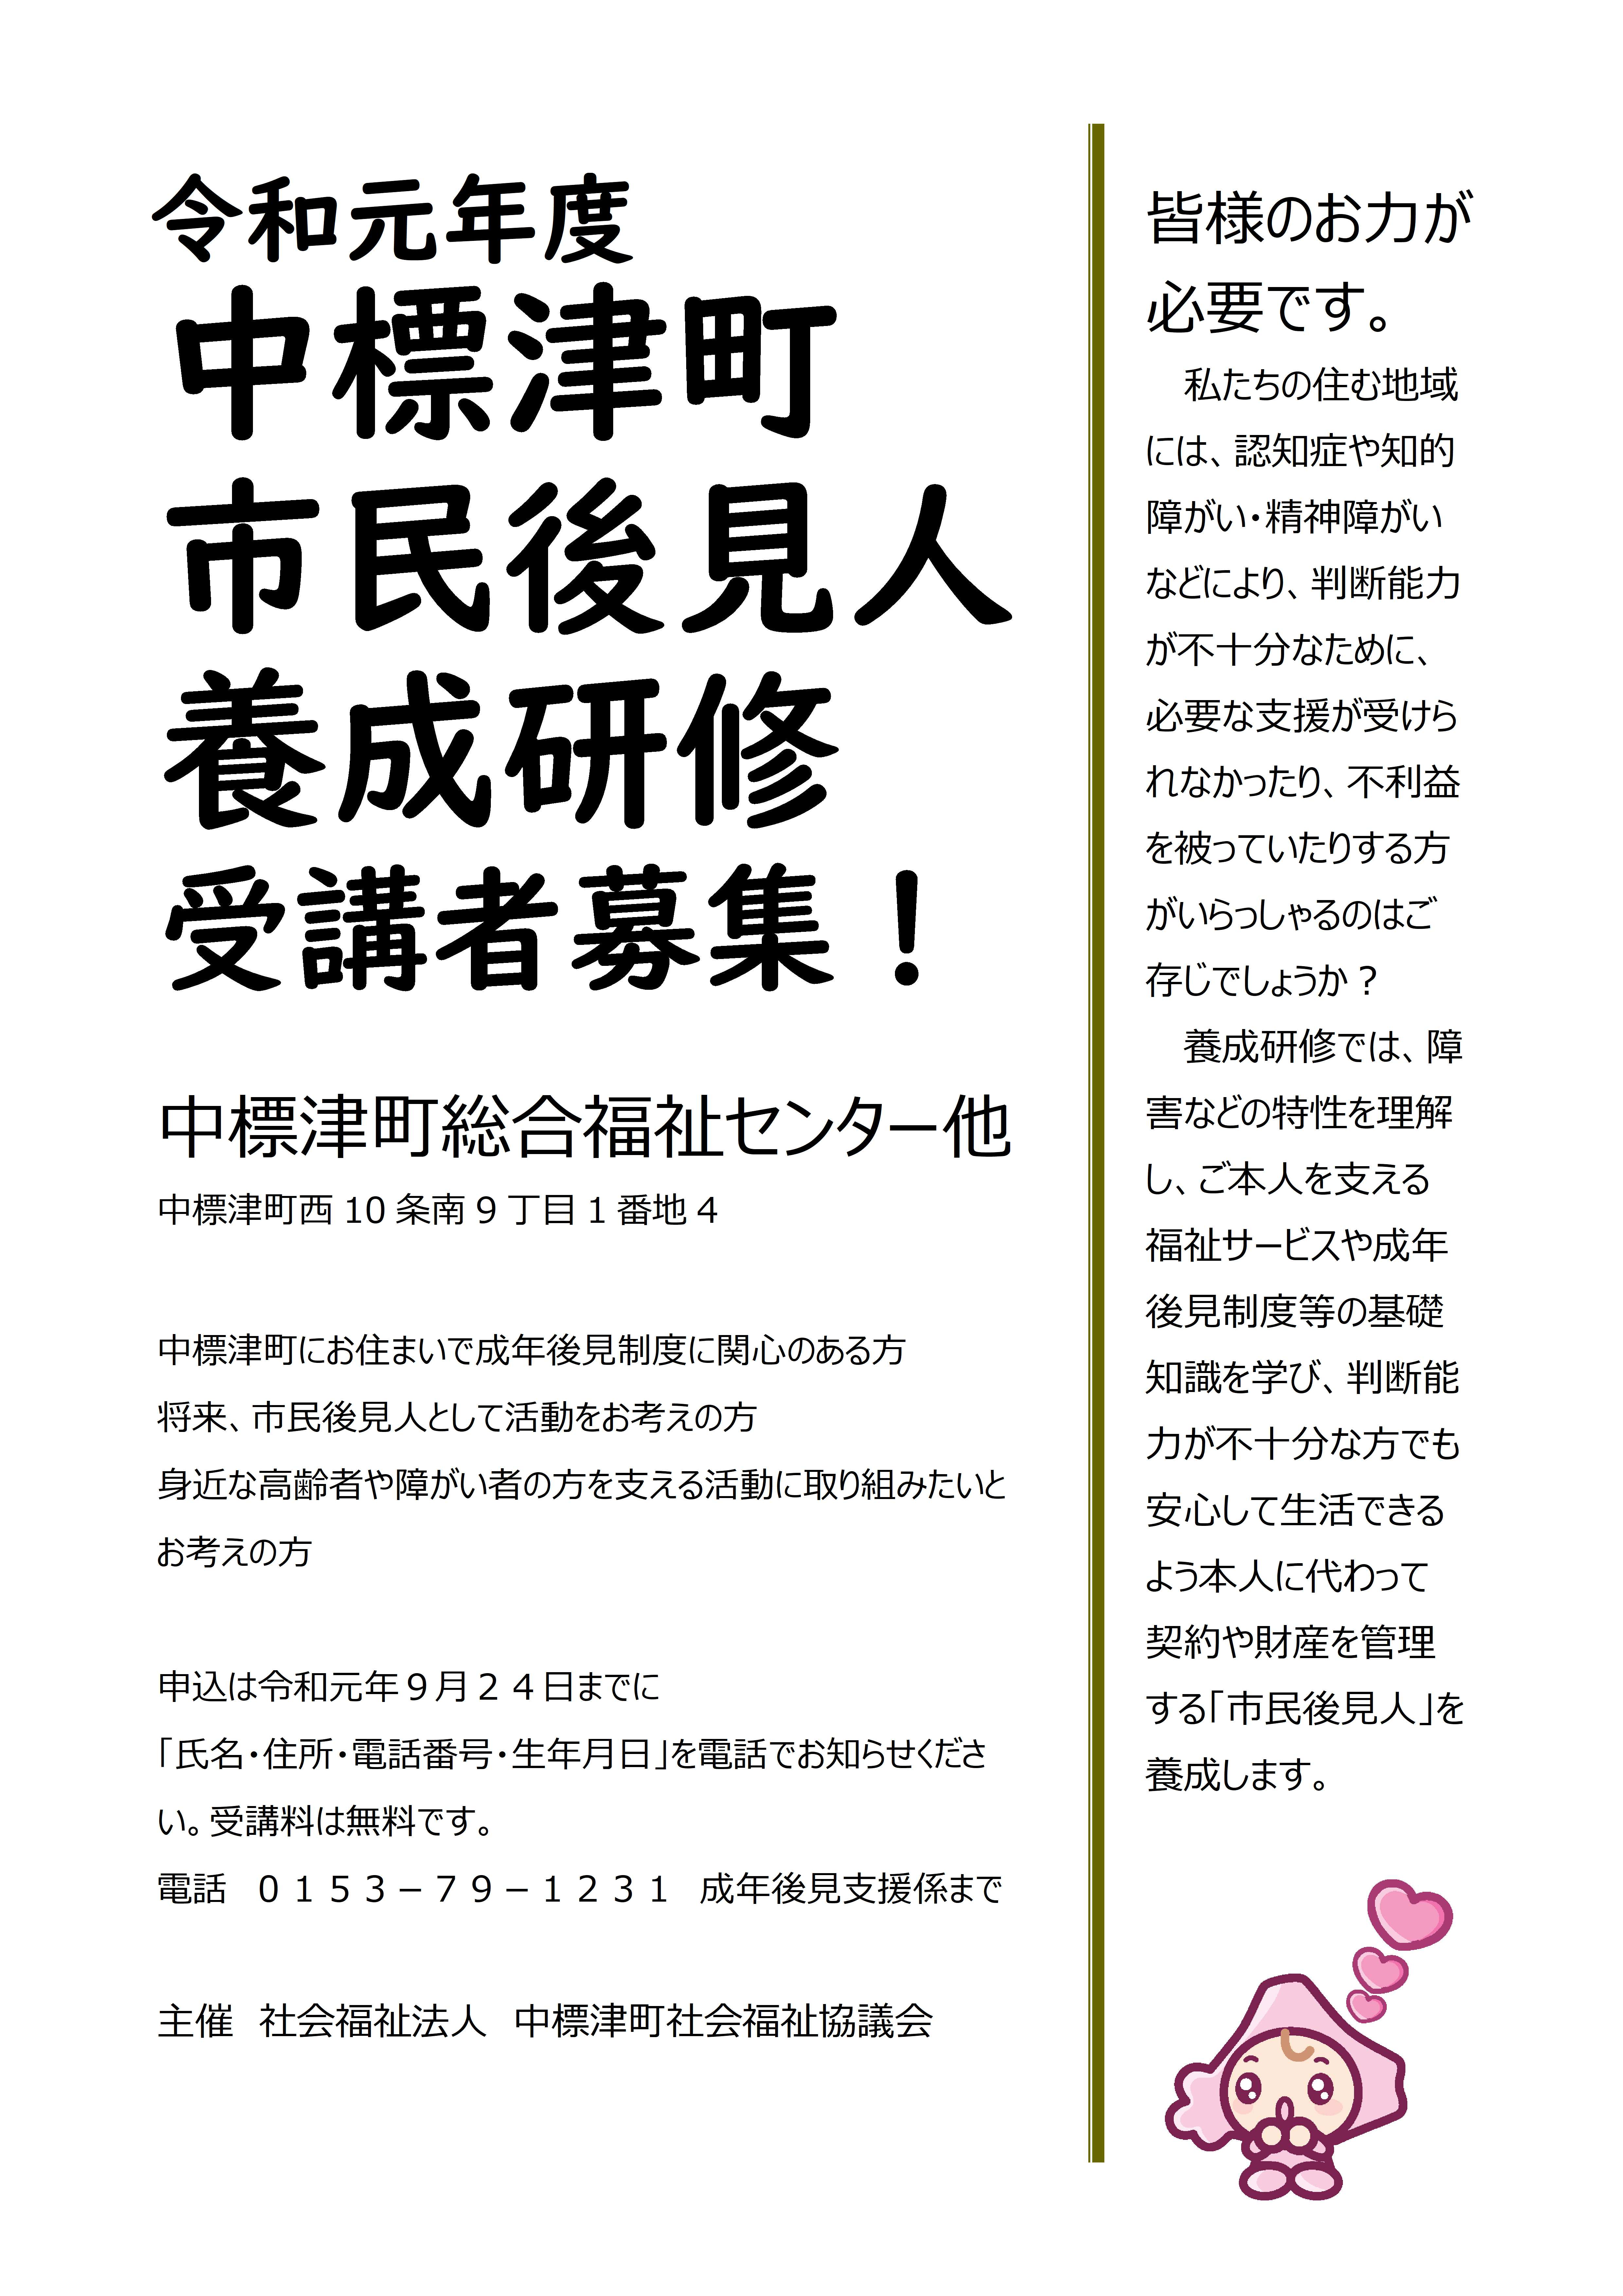 2019.08.26_R01shimiyousei1.jpg